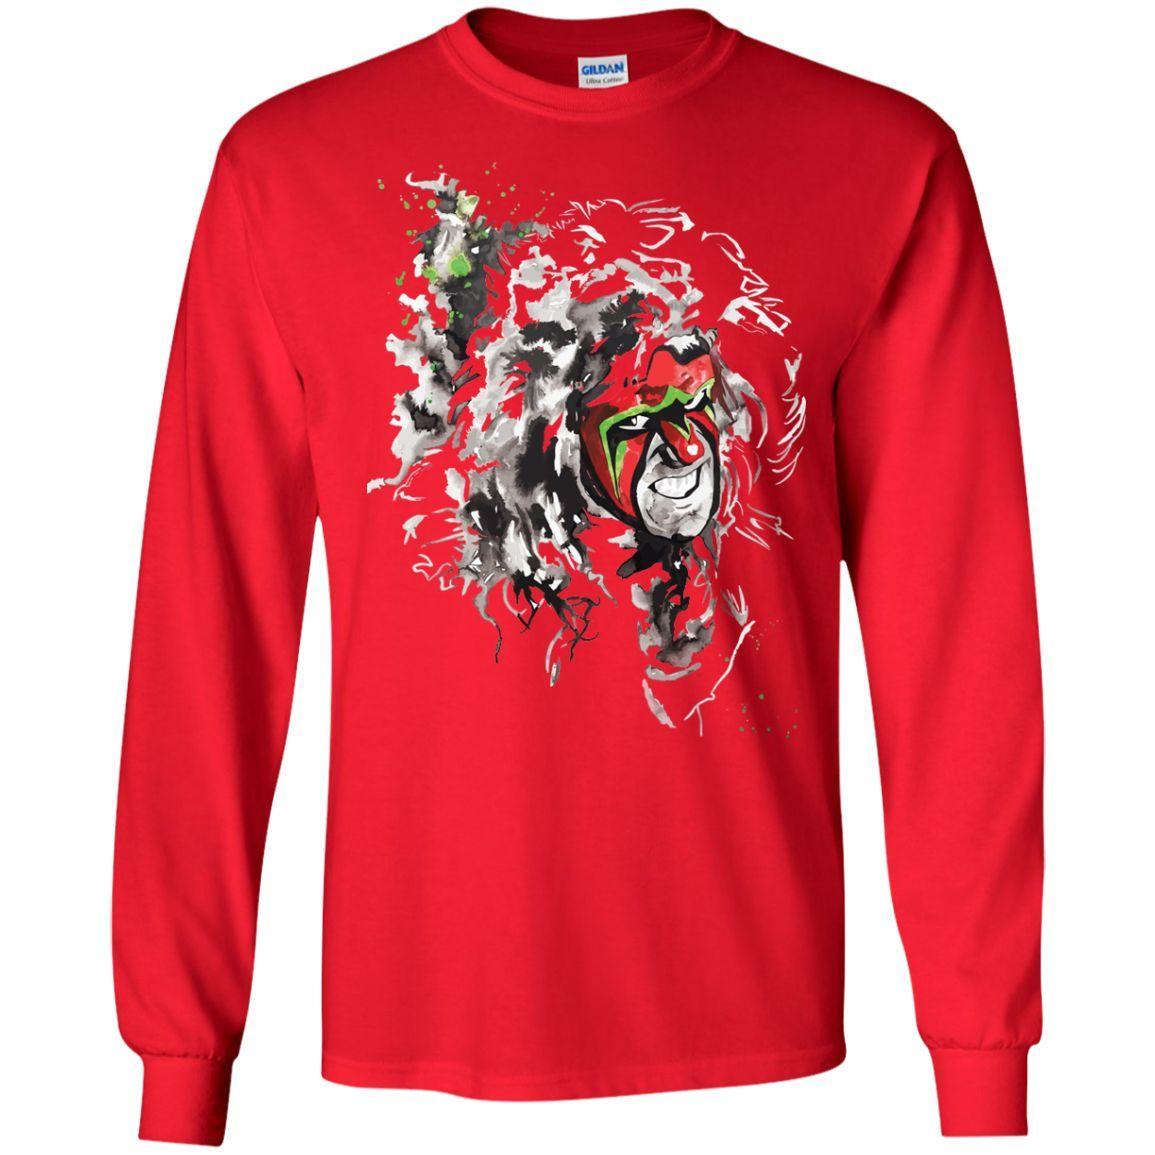 WWE Ultimate Warrior Mens White T-shirt (1)-01 LS Ultra Cotton Tshirt